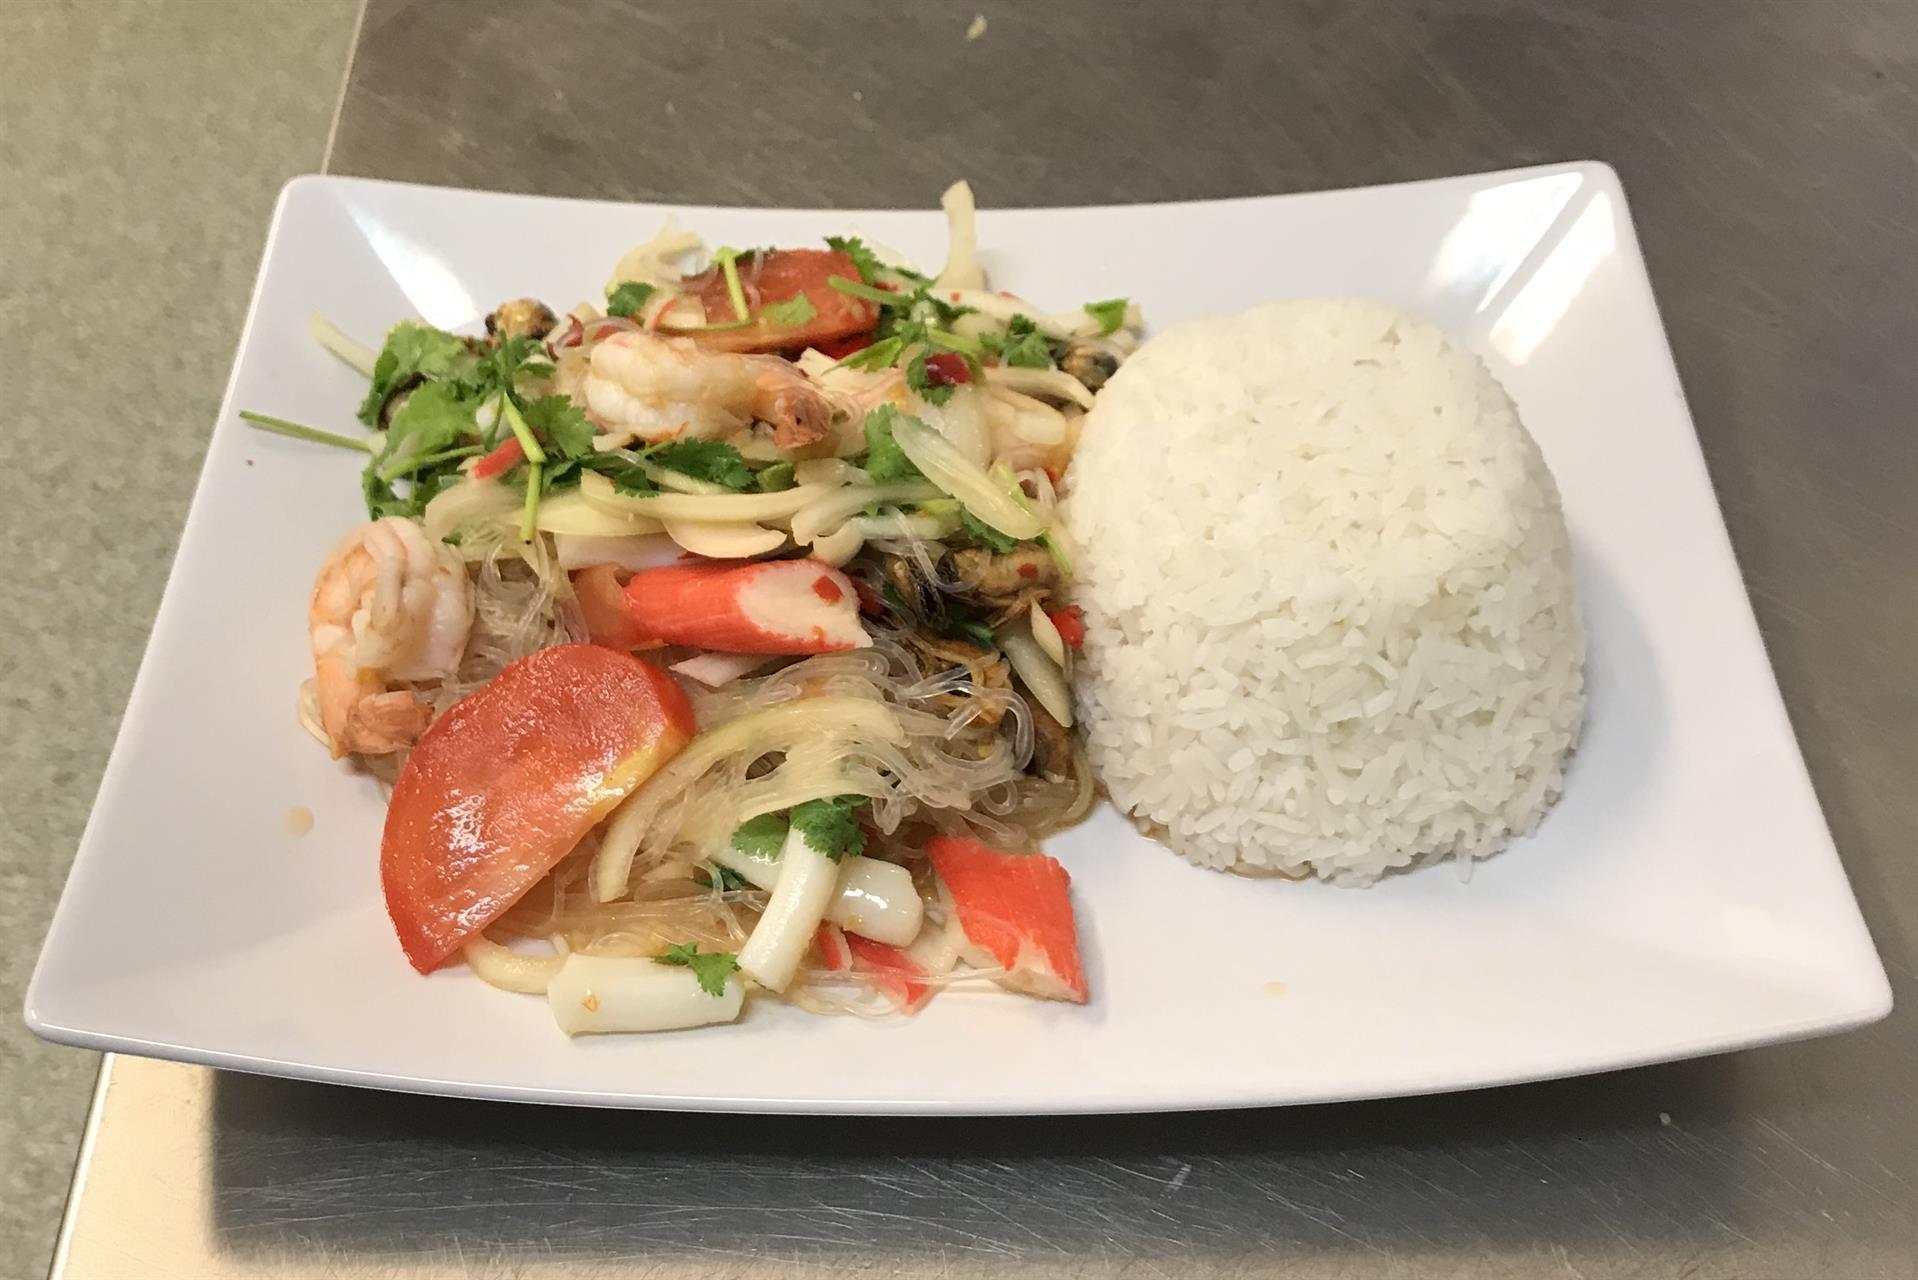 30. Yum Seafood